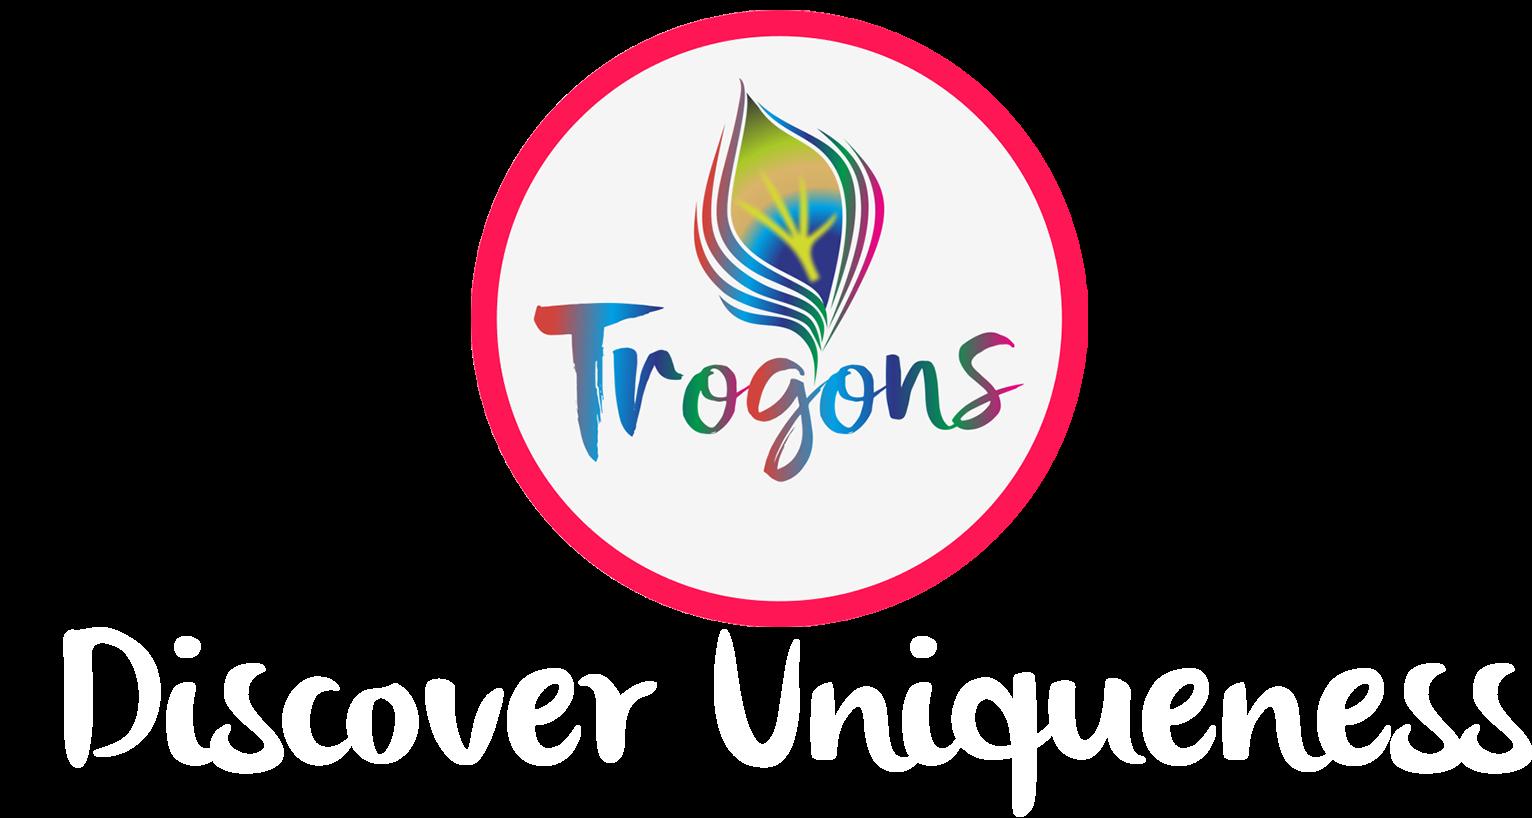 Trogons